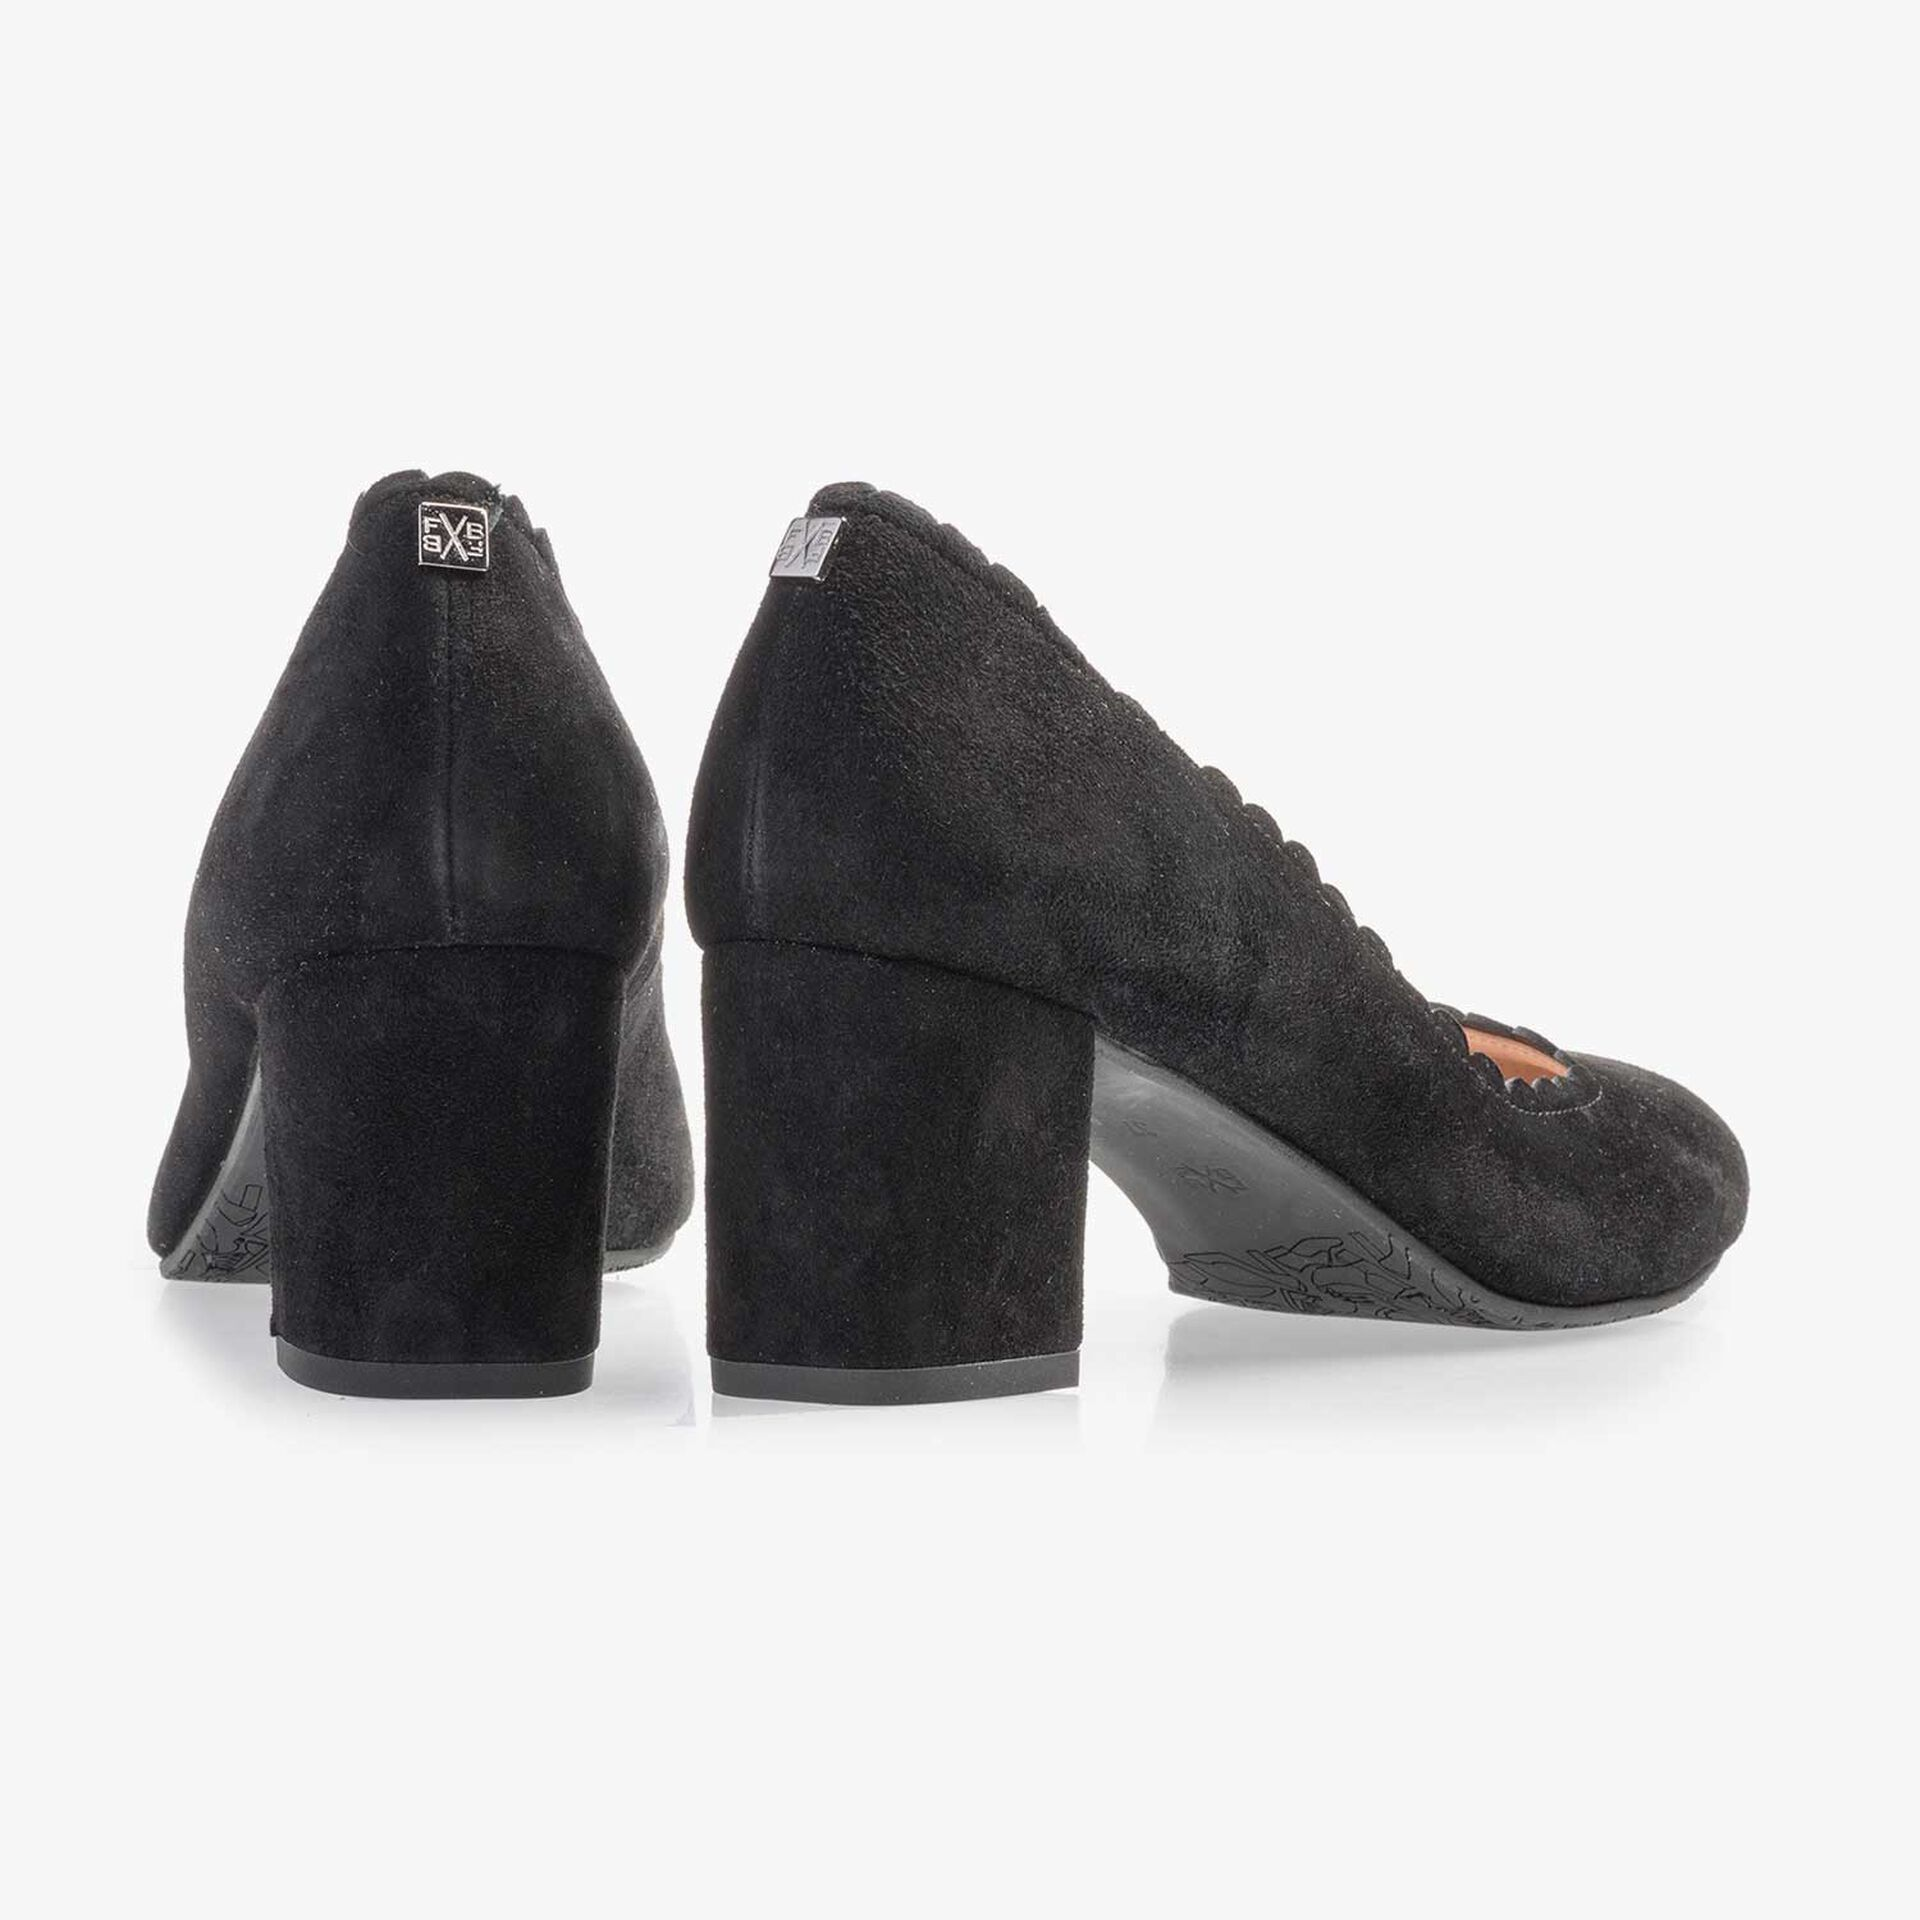 Black suede leather pumps